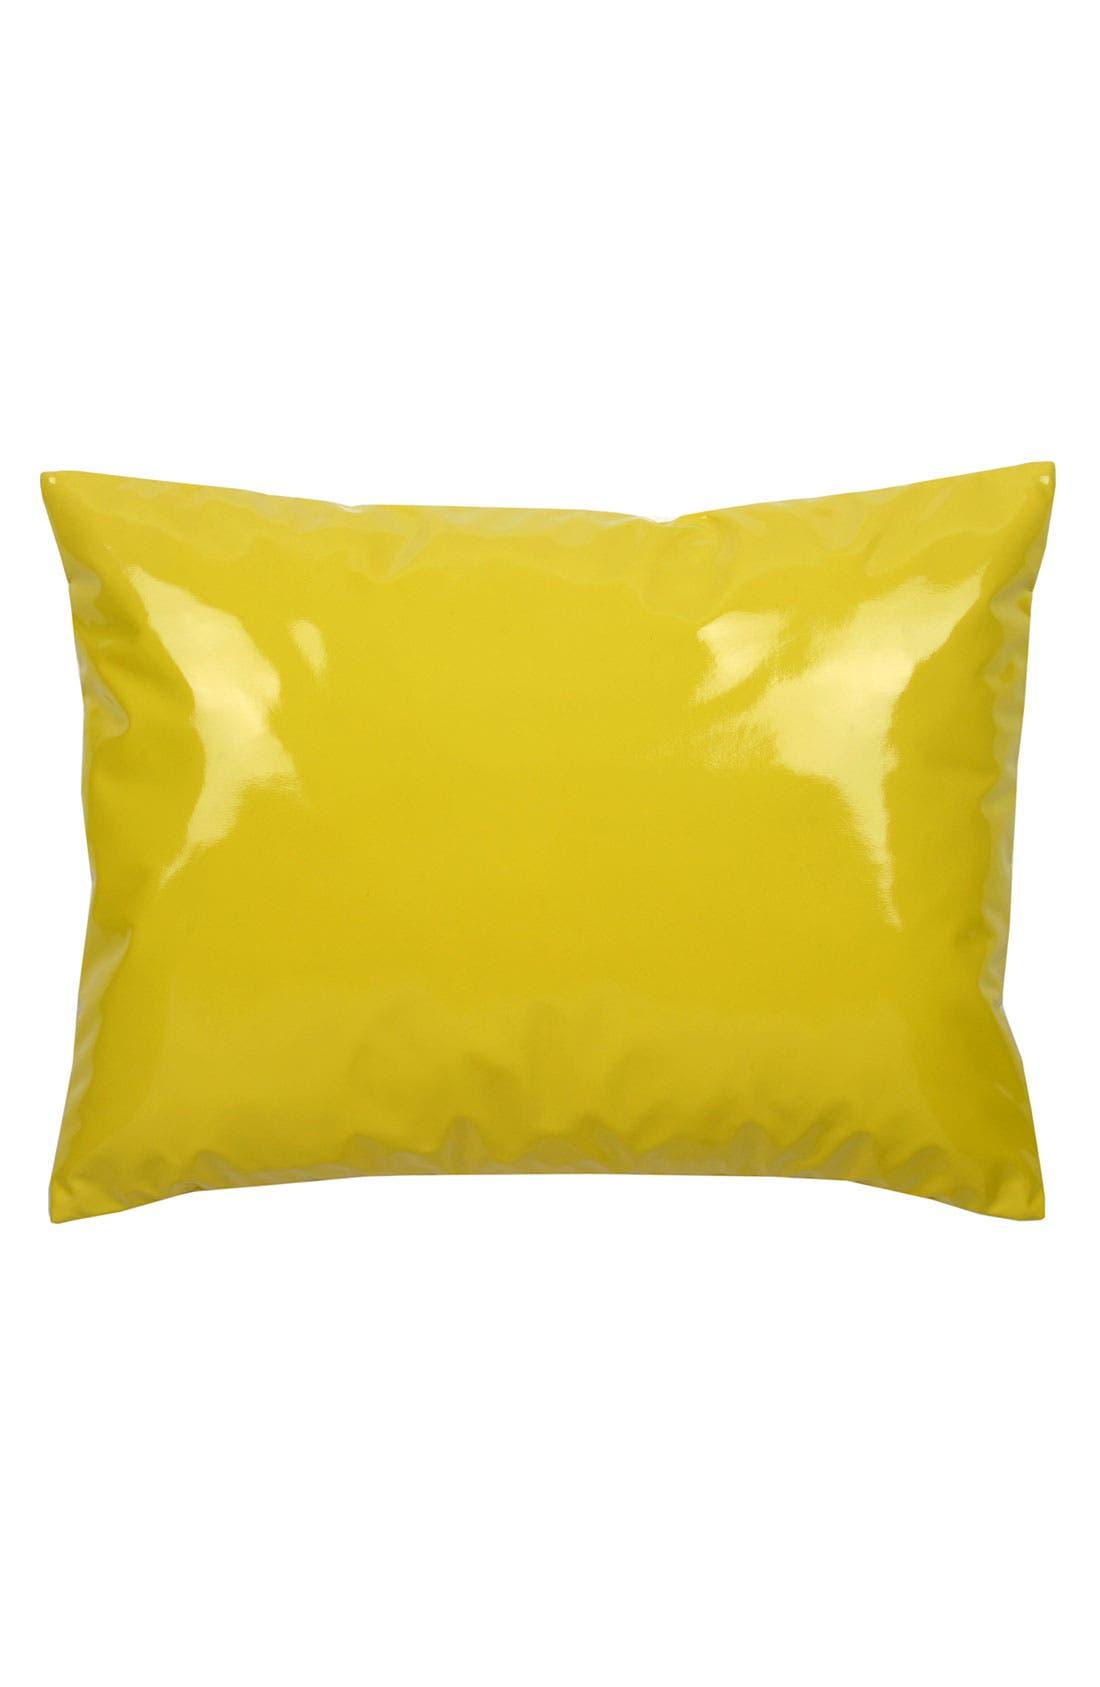 Main Image - Blissliving Home 'Empire' Pillow